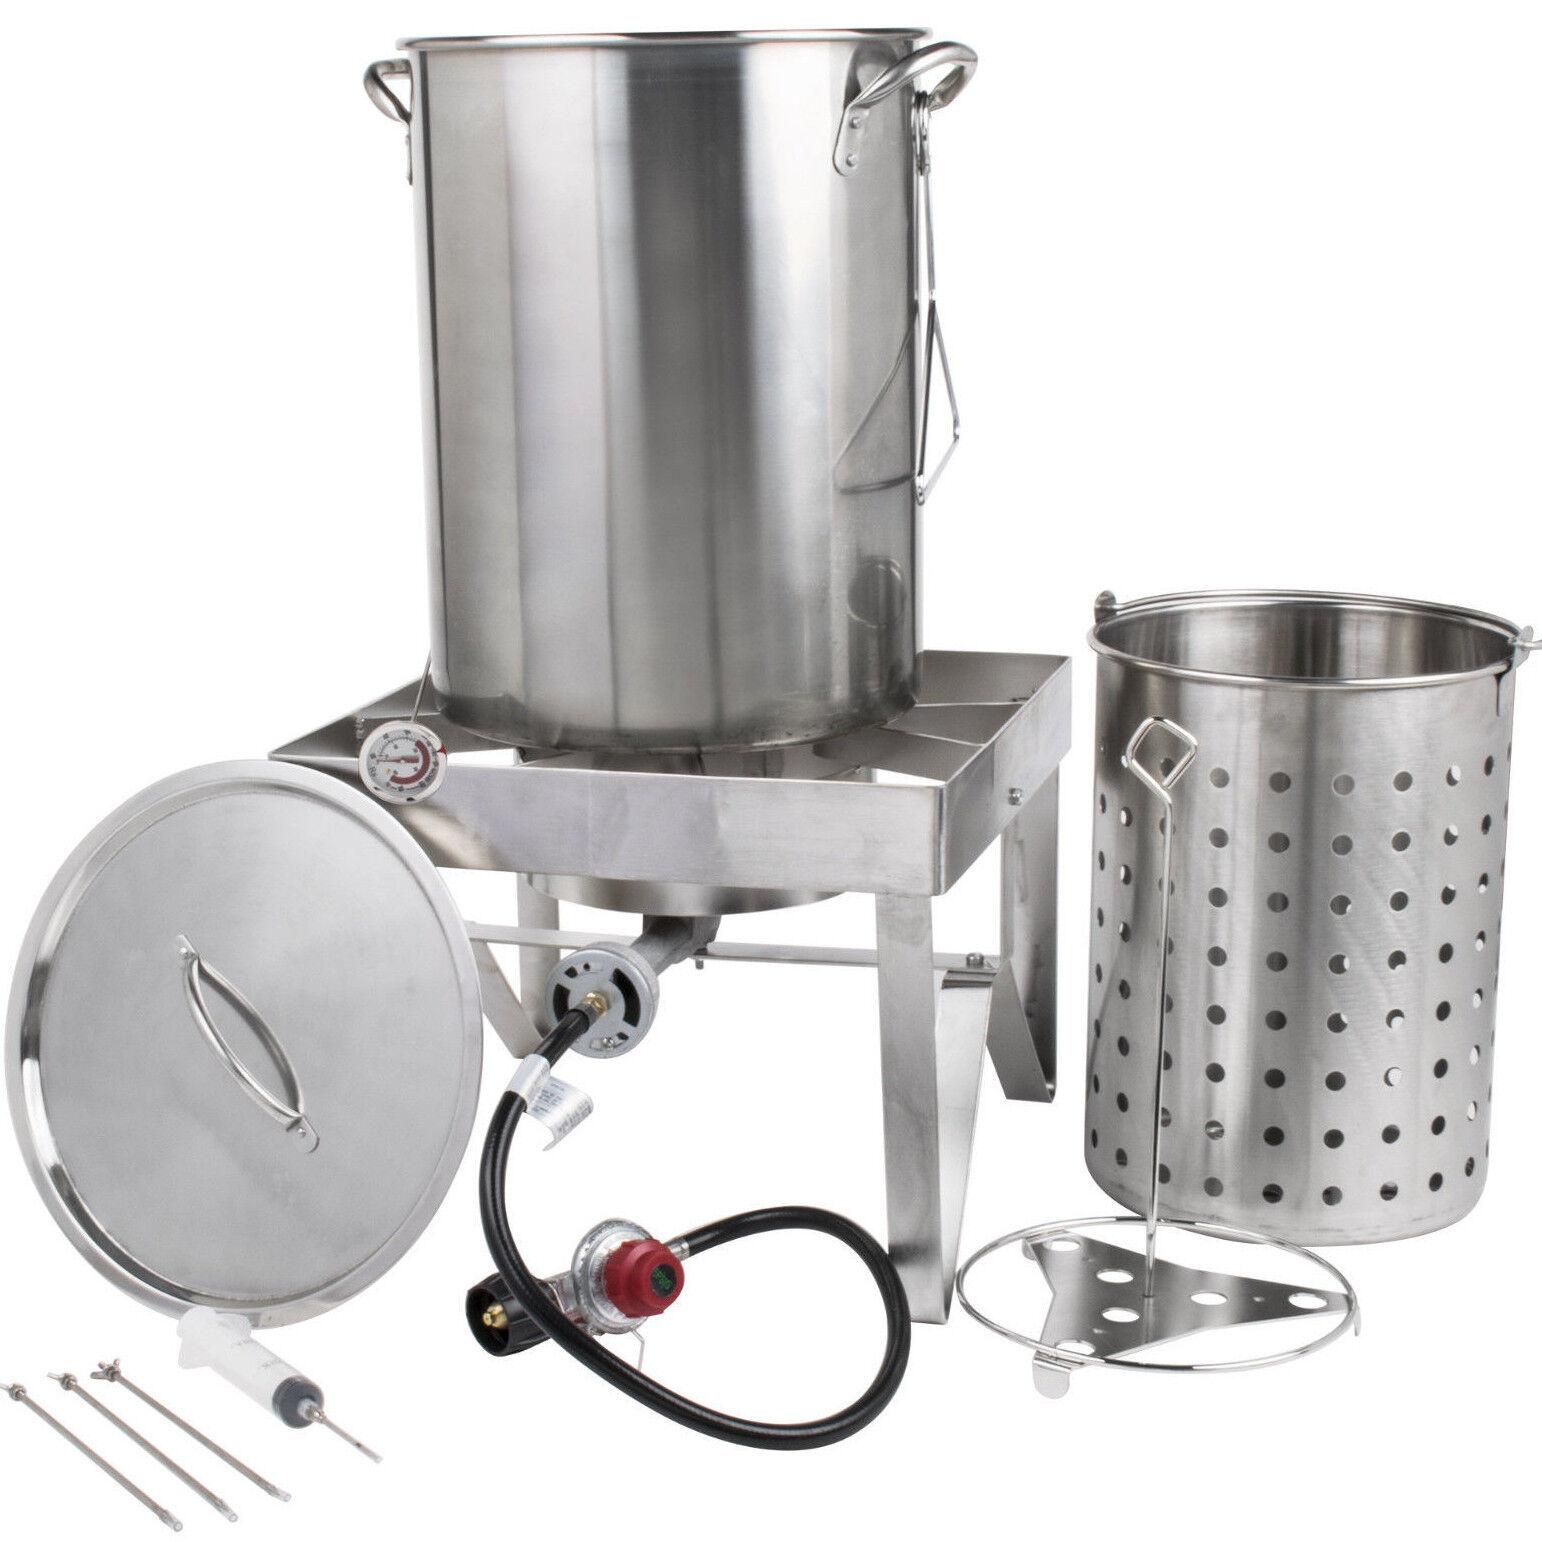 30 Qt STAINLESS STEEL Turkey Deep Fryer Kit Steamer Stock Po